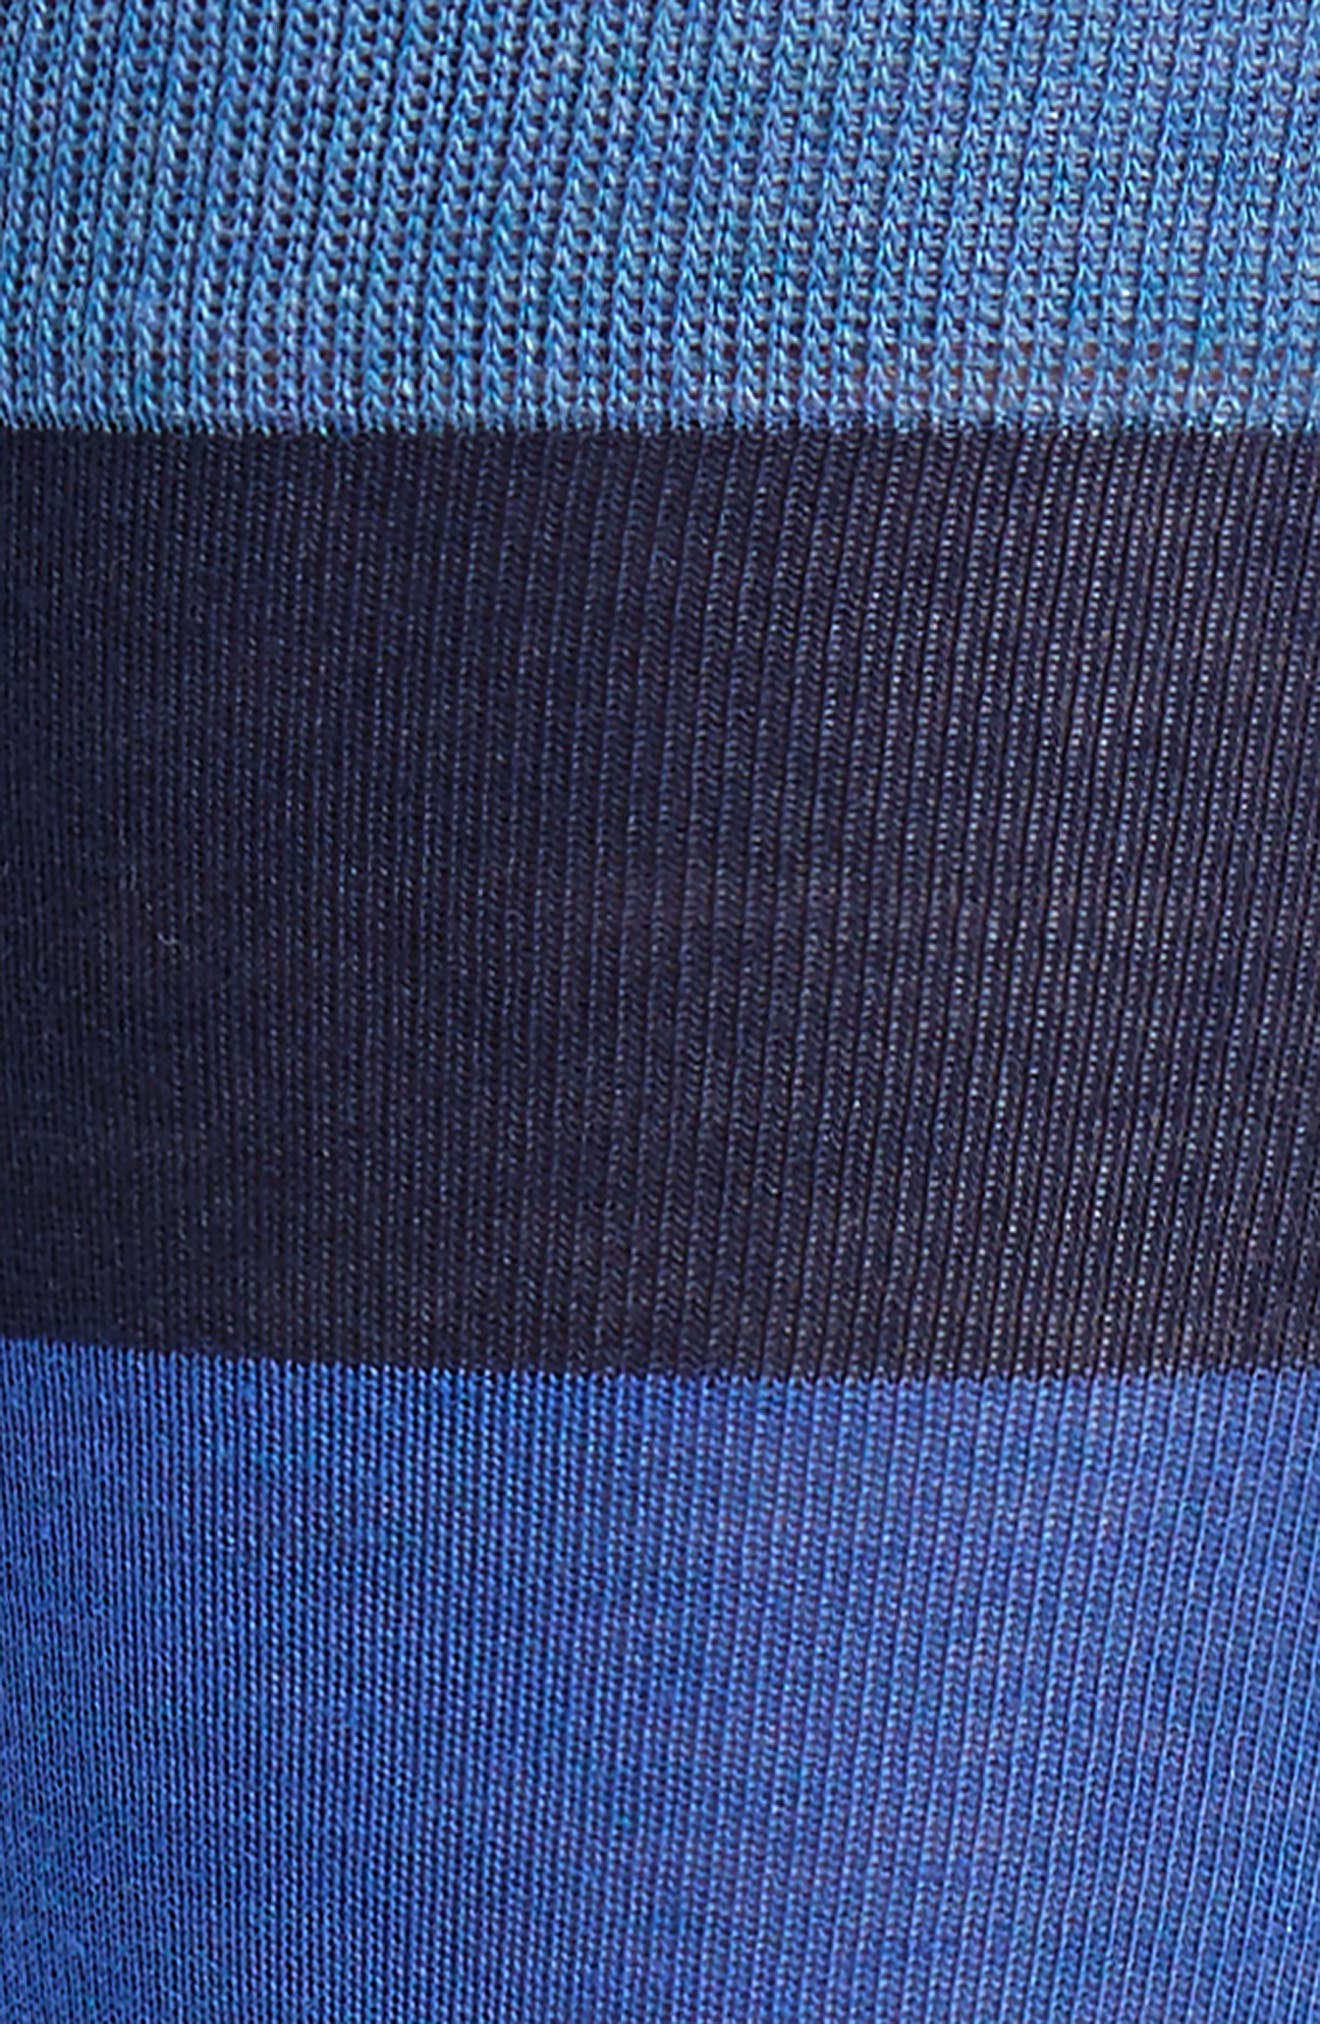 Alternate Image 2  - Calibrate Colorblock Socks (3 for $30)